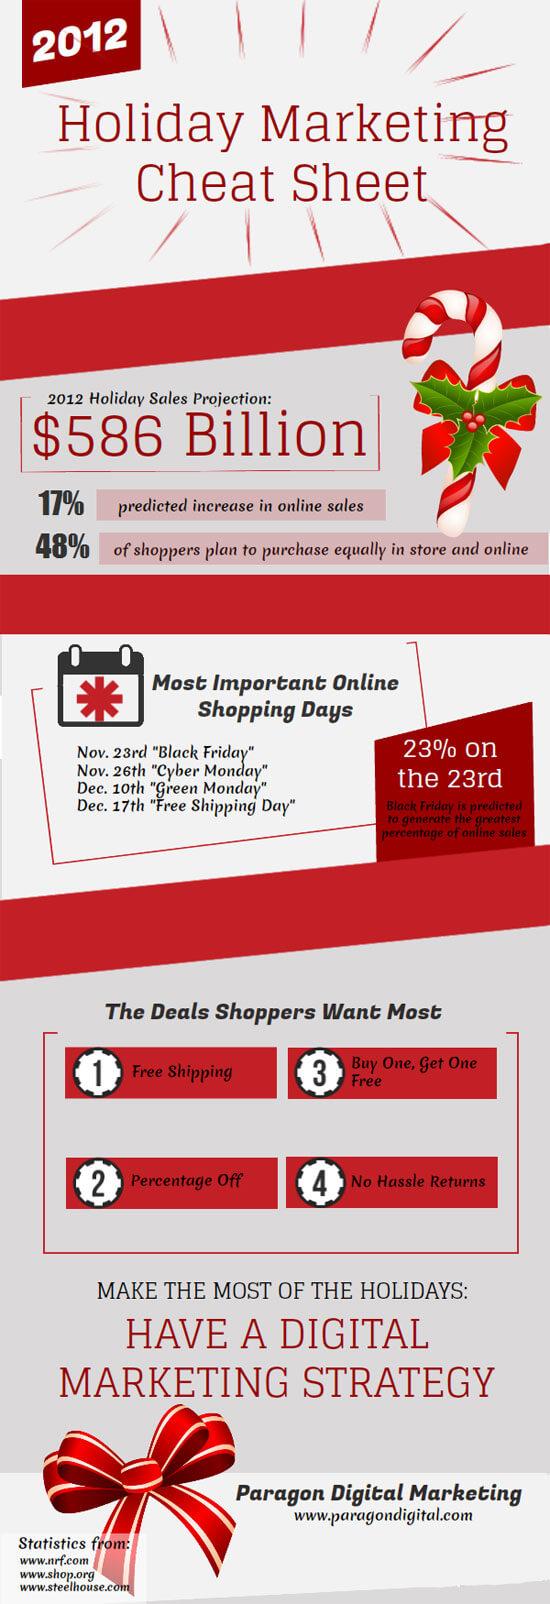 Holiday Marketing Cheat Sheet 2012 Infographic